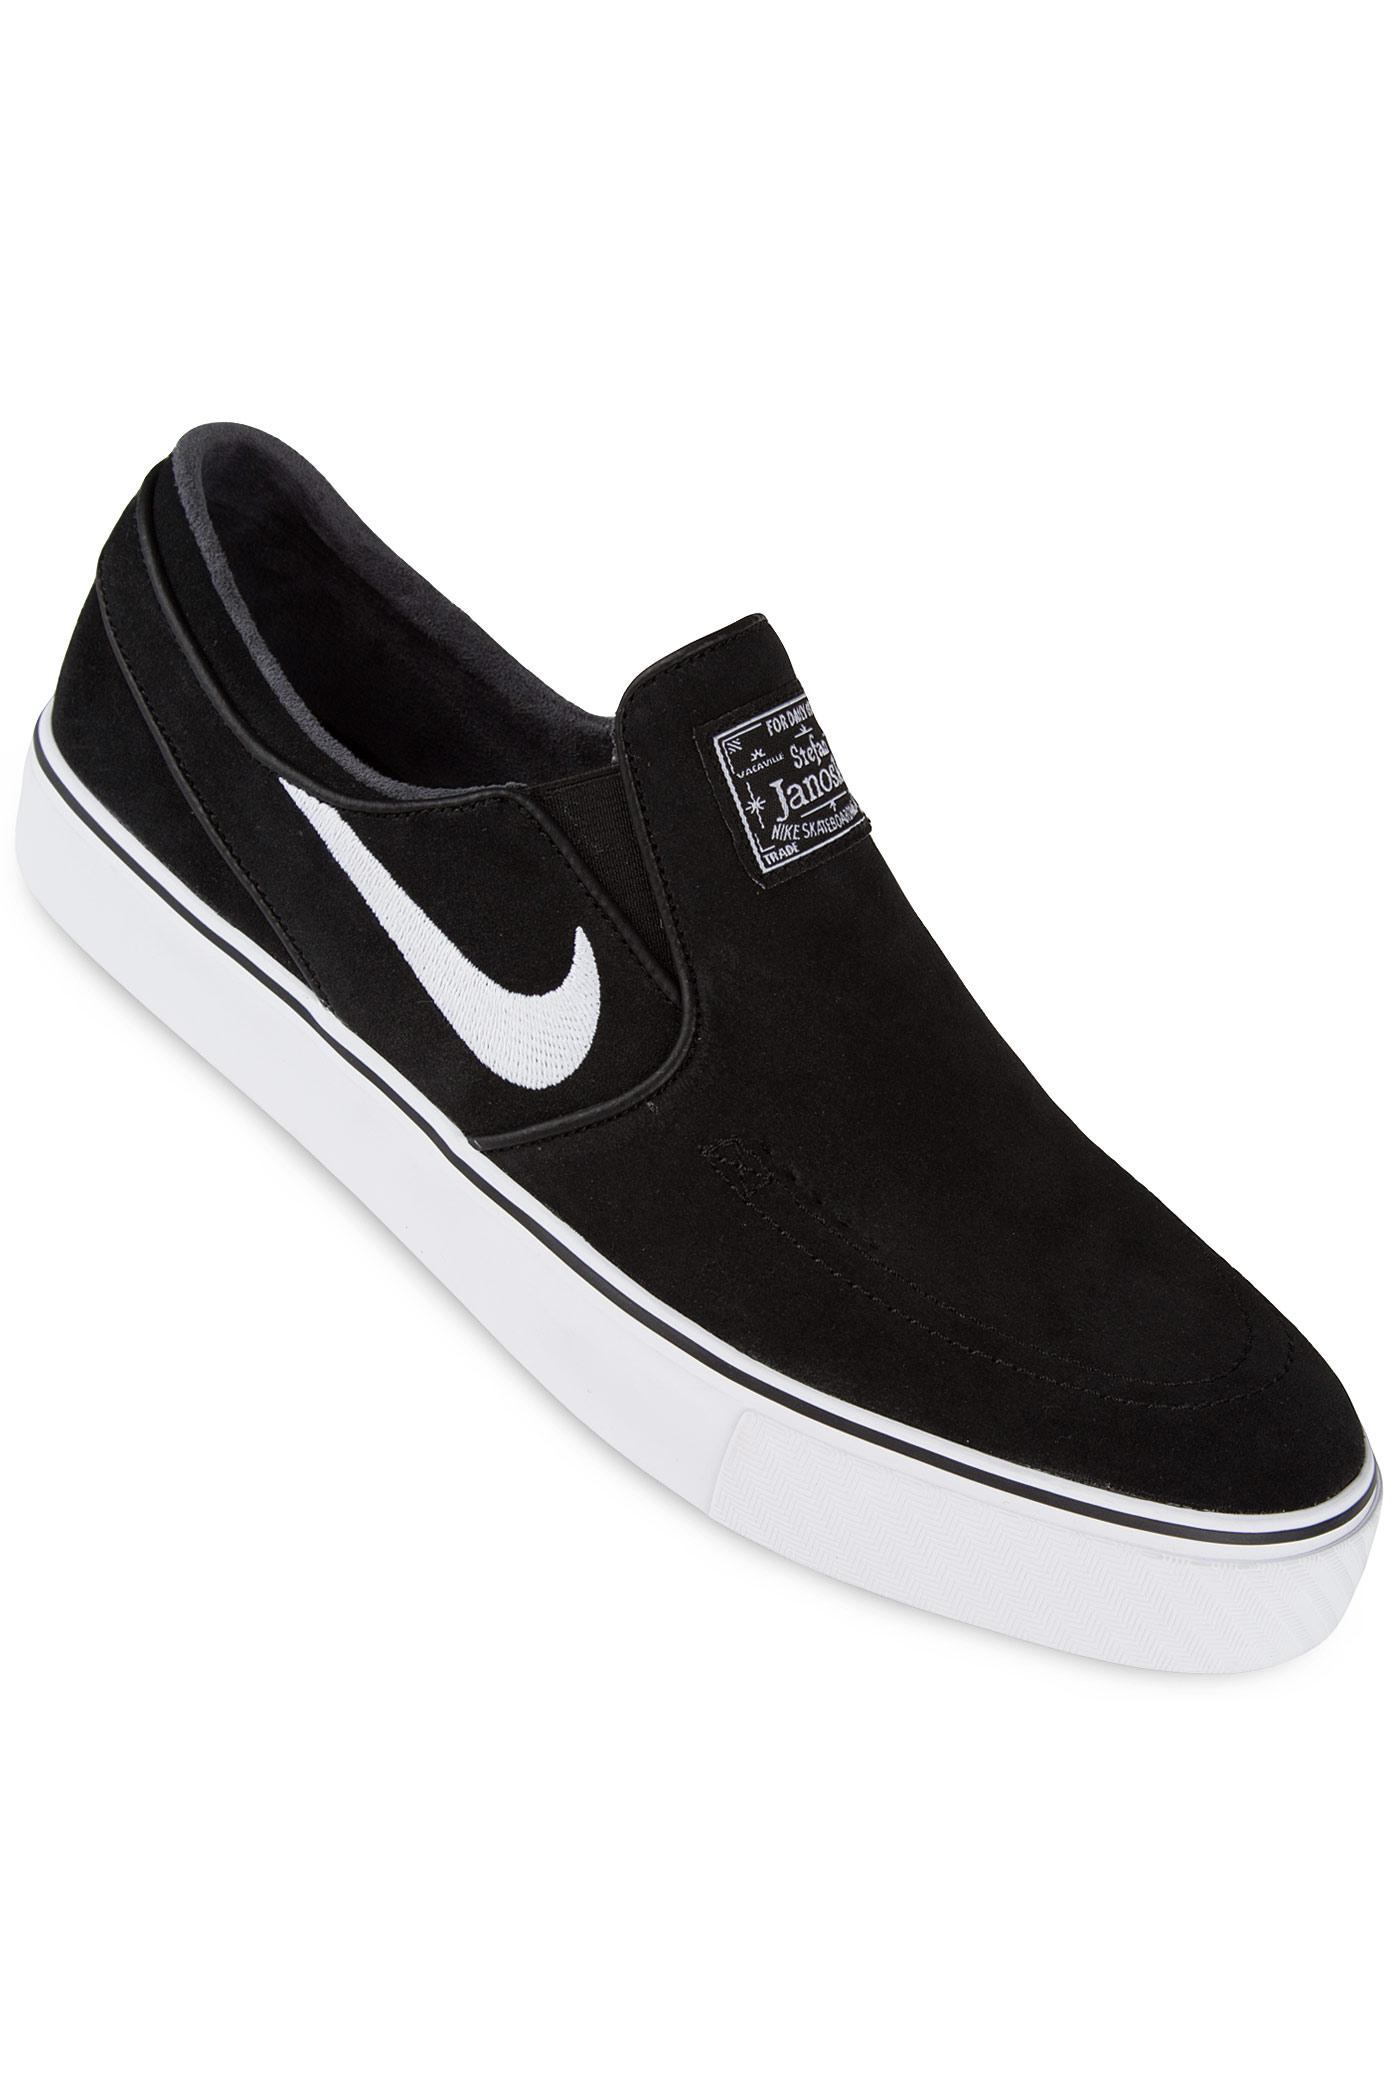 nike sb zoom stefan janoski slip shoes black white buy